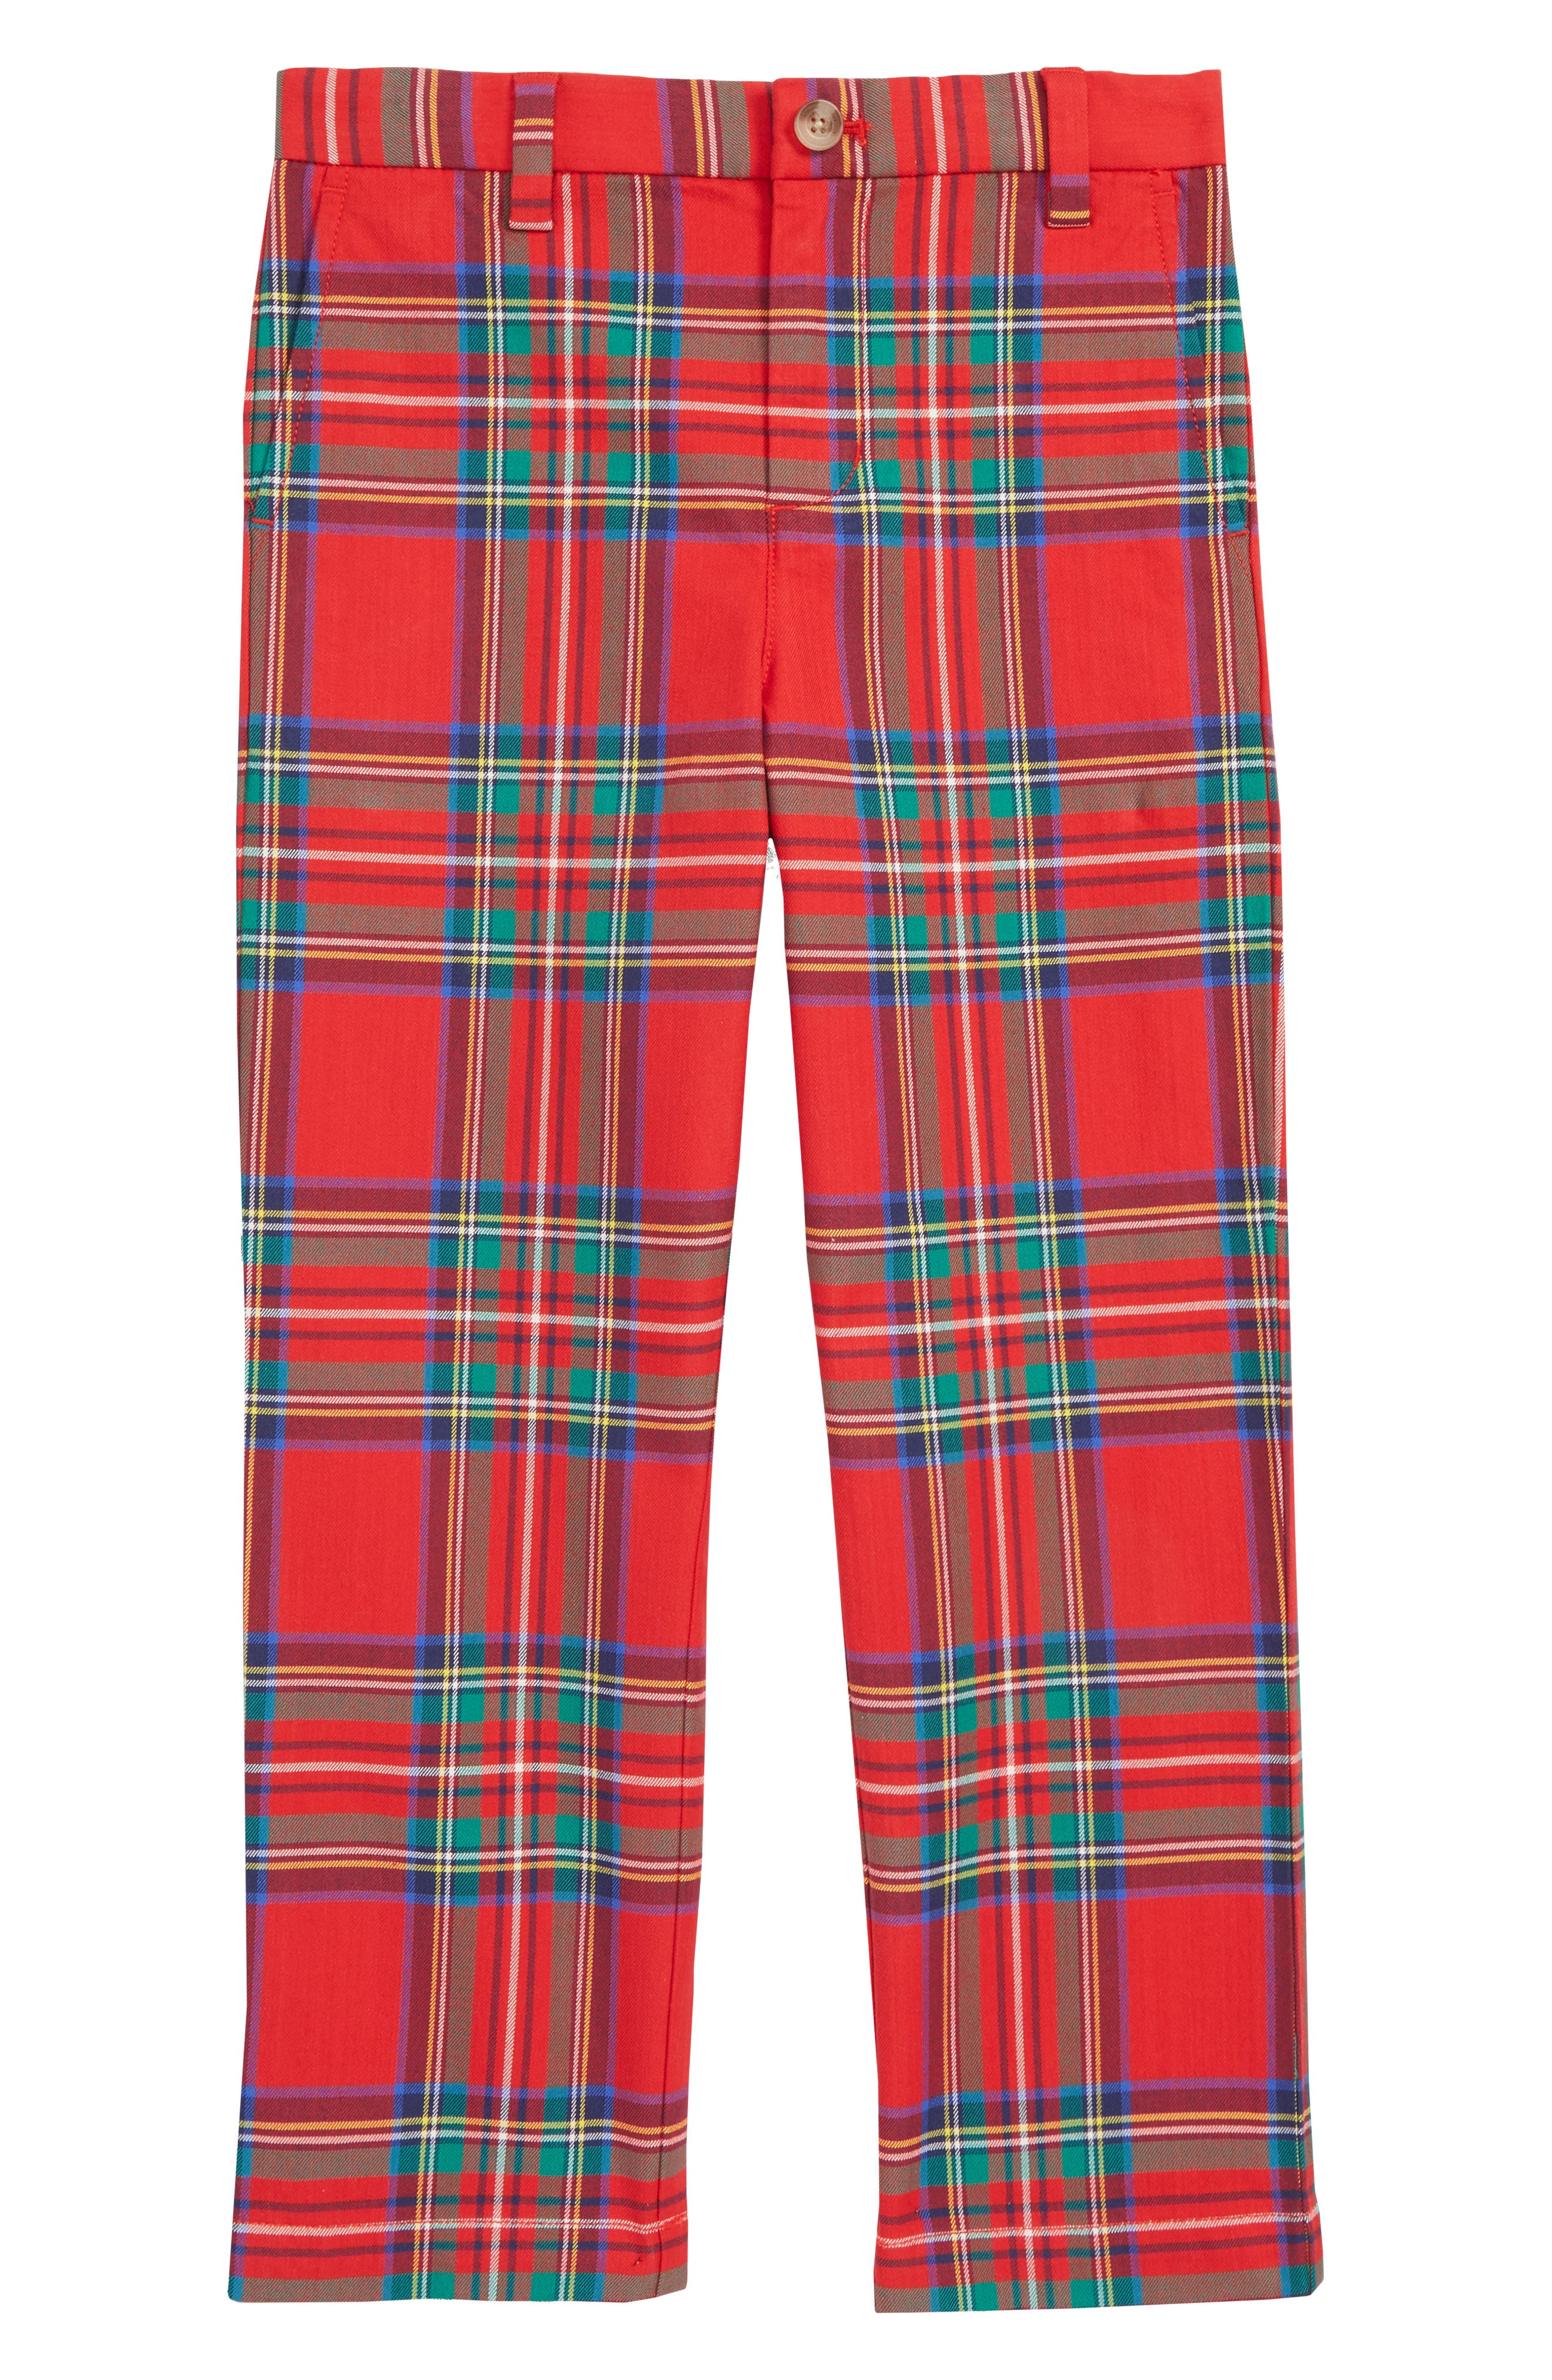 VINEYARD VINES Jolly Plaid Breaker Pants, Main, color, LIGHTHOUSE RED